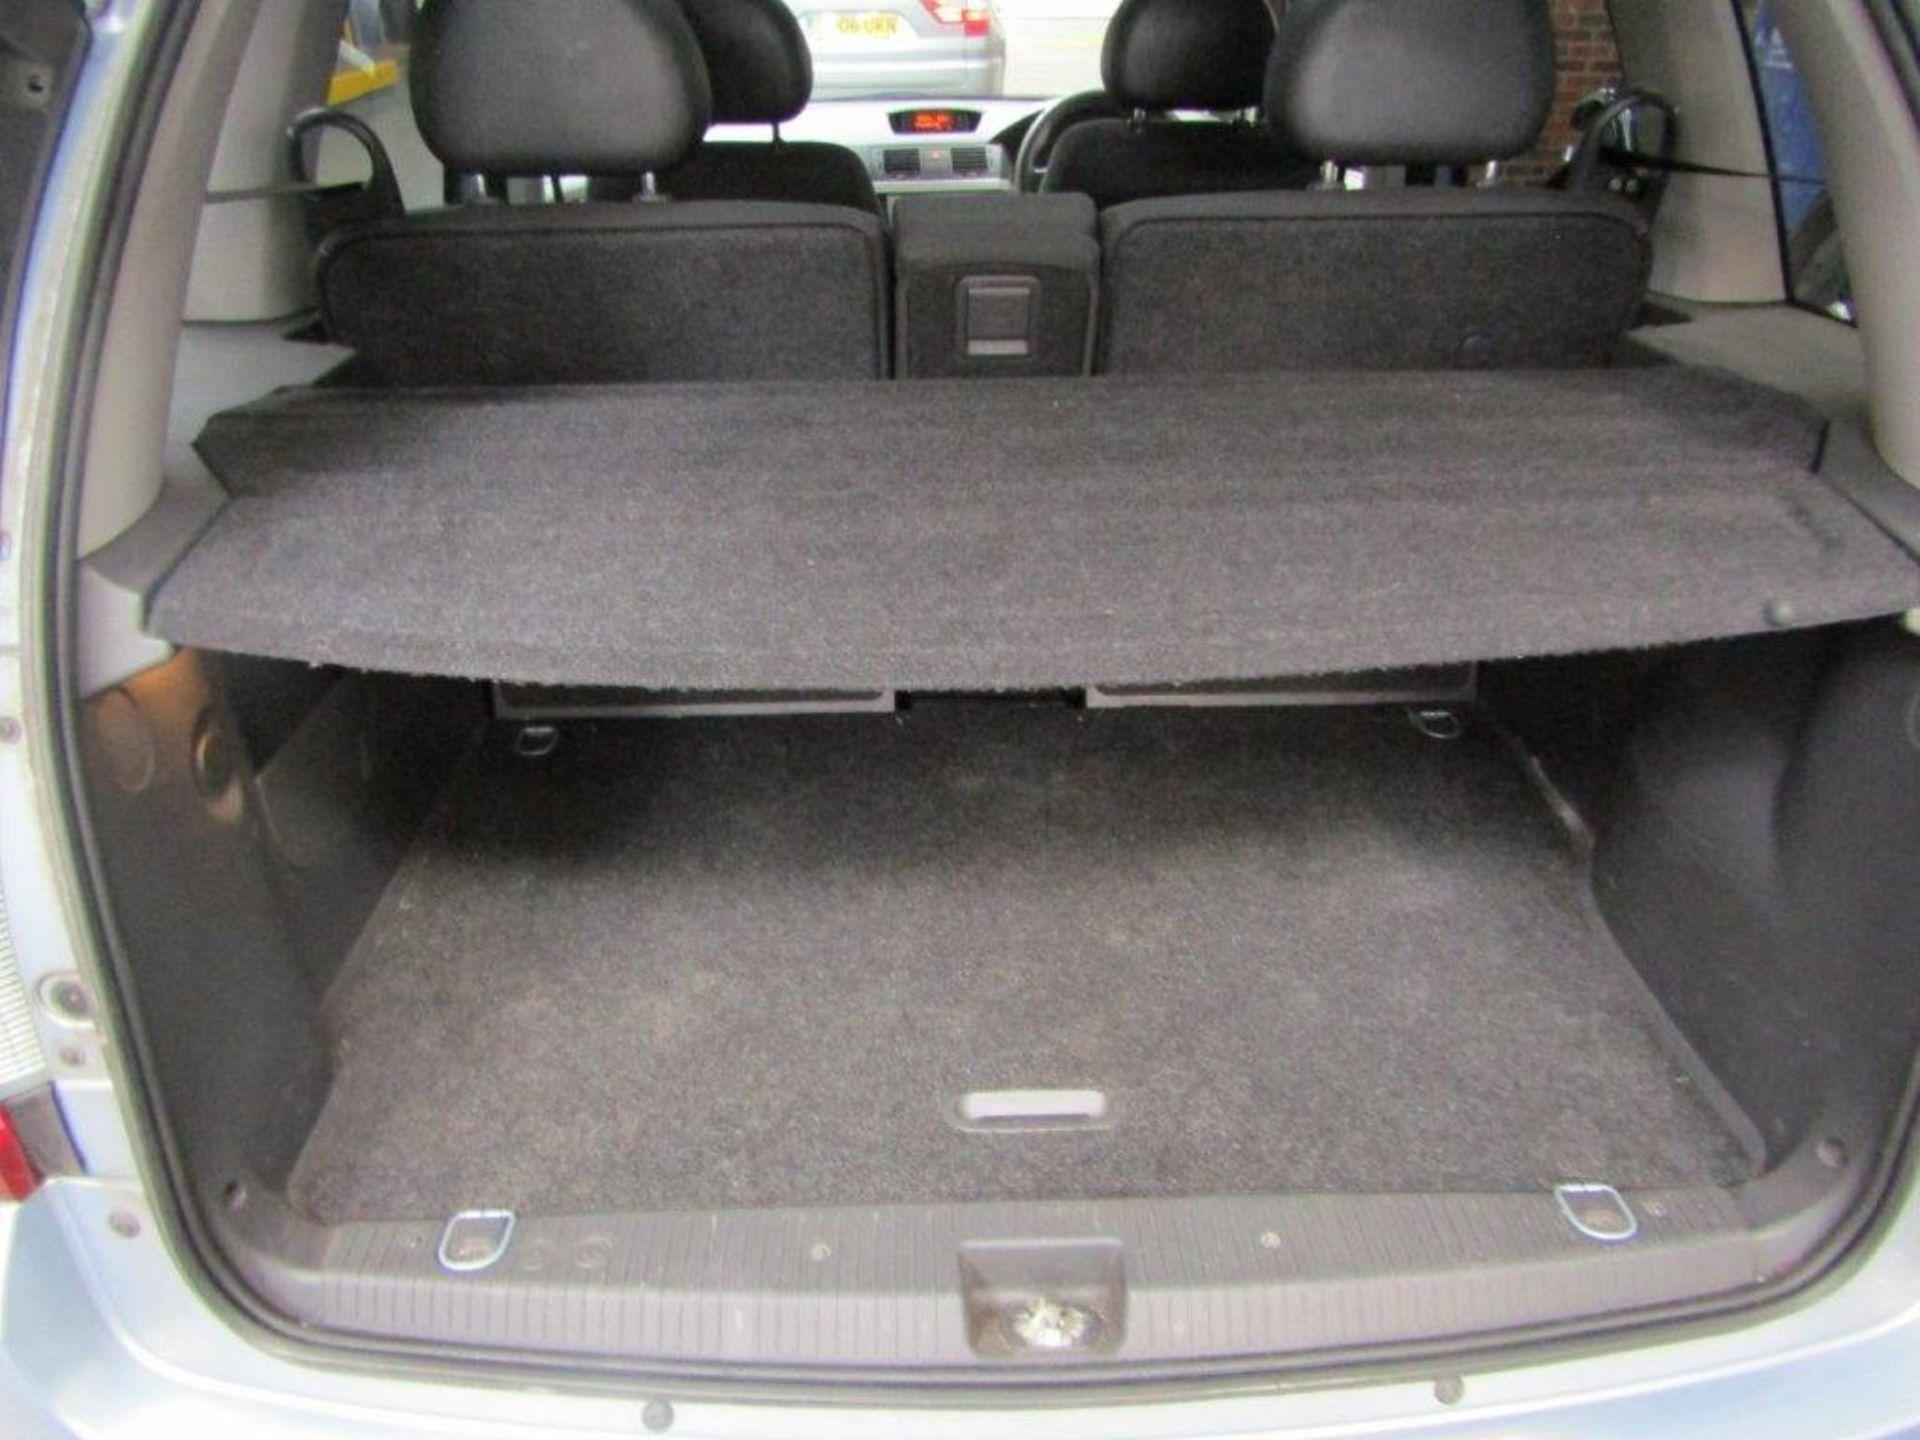 58 08 Vauxhall Meriva Design - Image 24 of 25